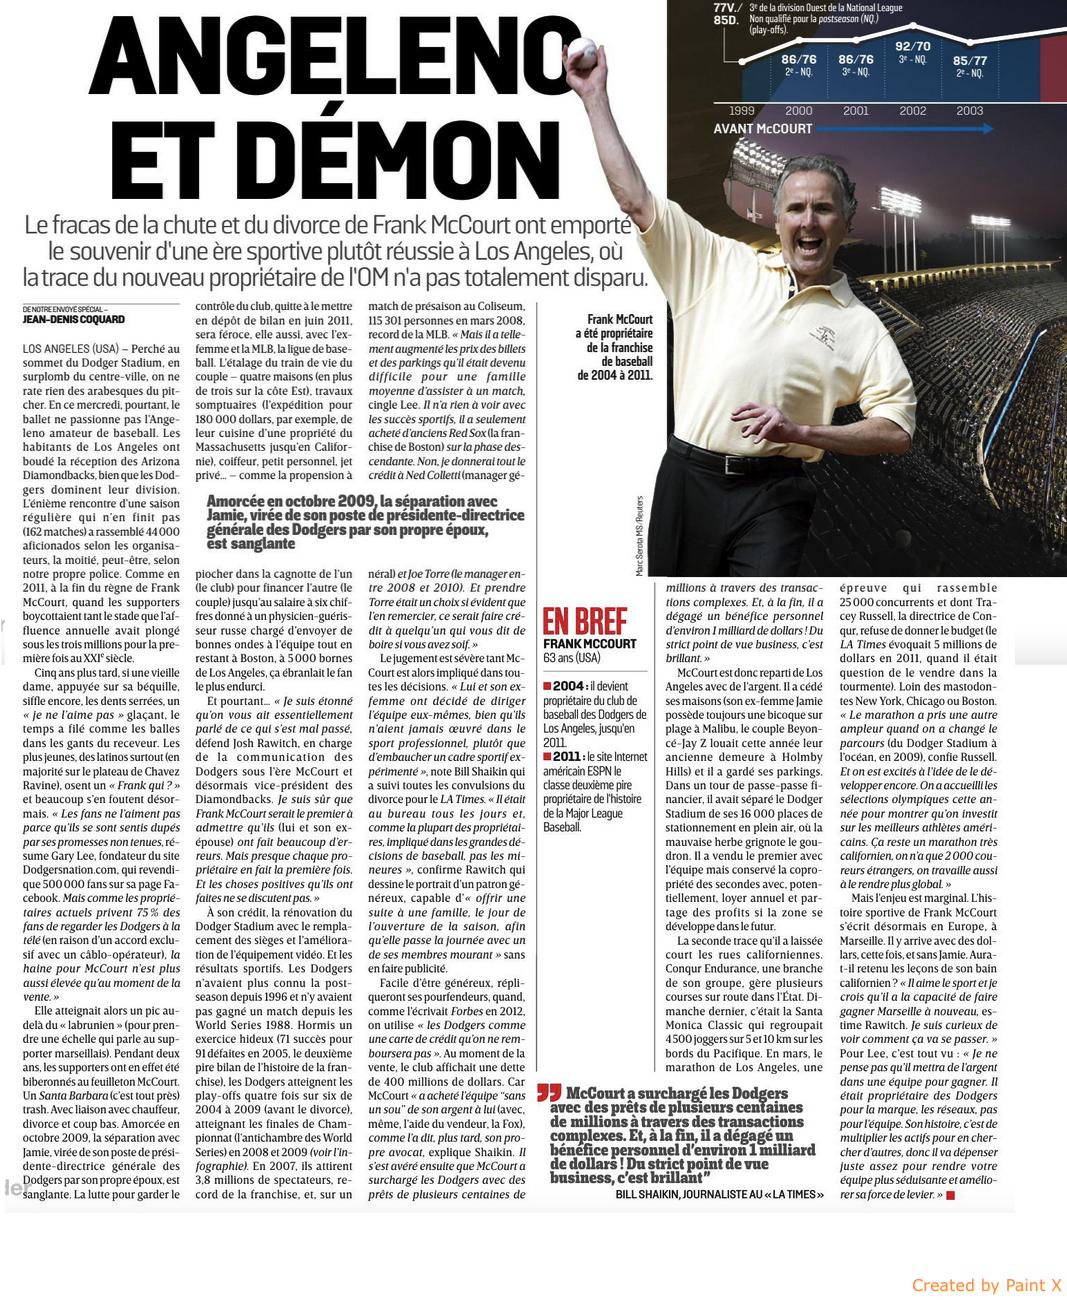 [Vente du club] Frank McCourt rachète l'OM ! - Page 26 160917111605136862